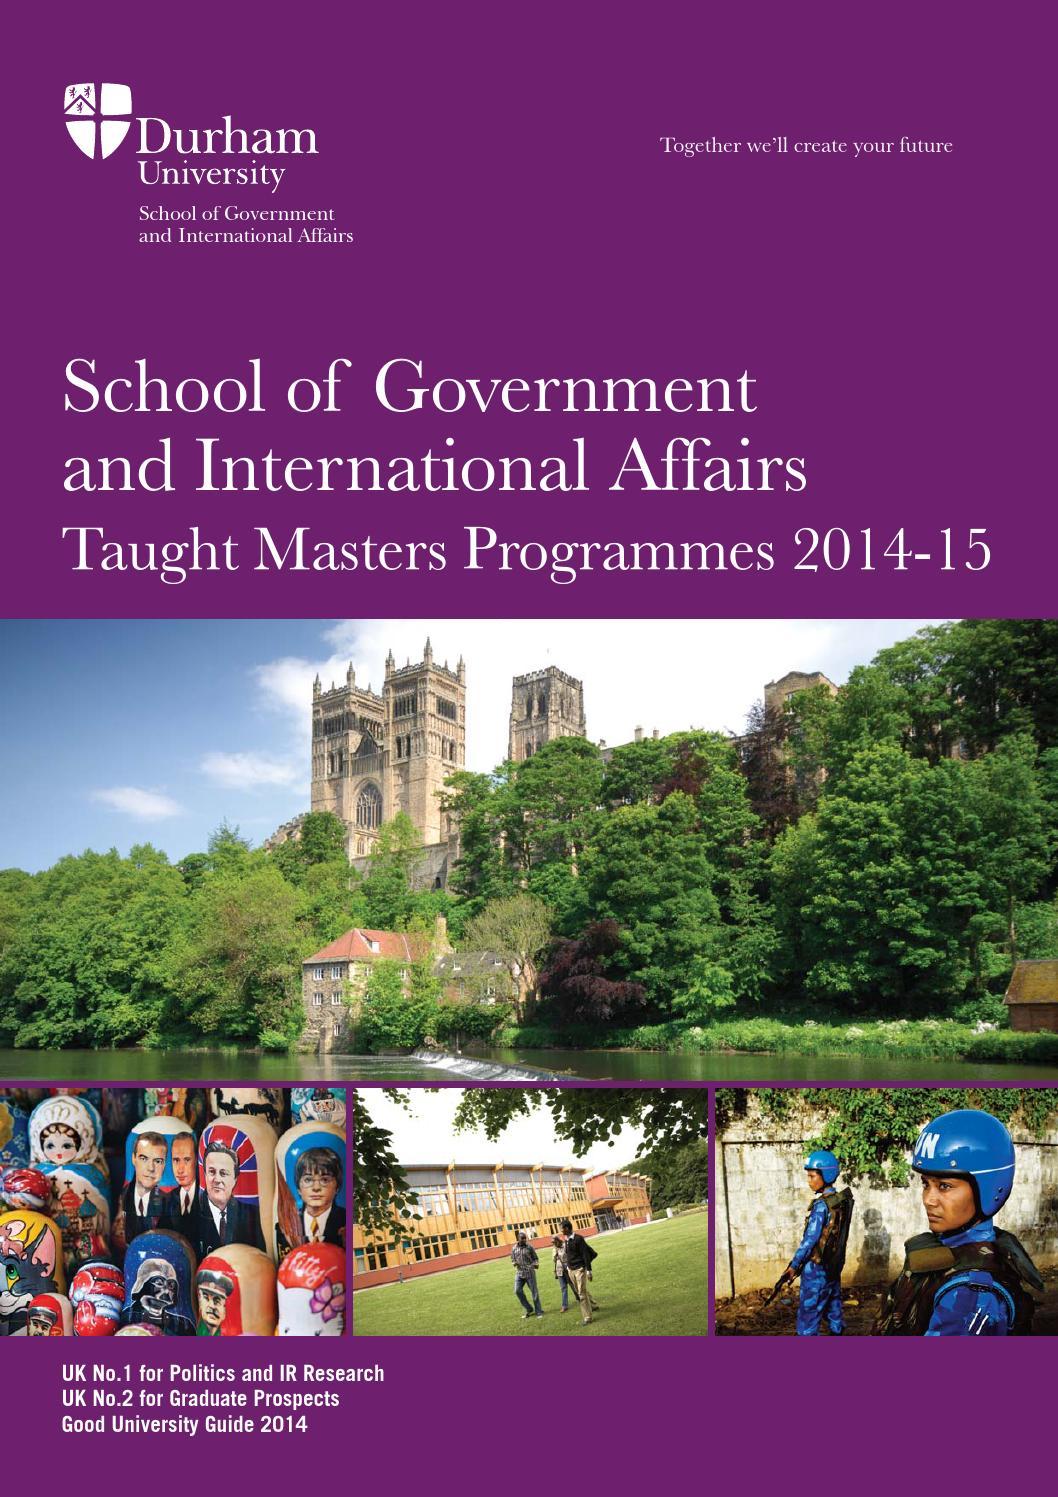 Sgia taught masters programmes 2014 15 by durham university issuu - Durham college international office ...